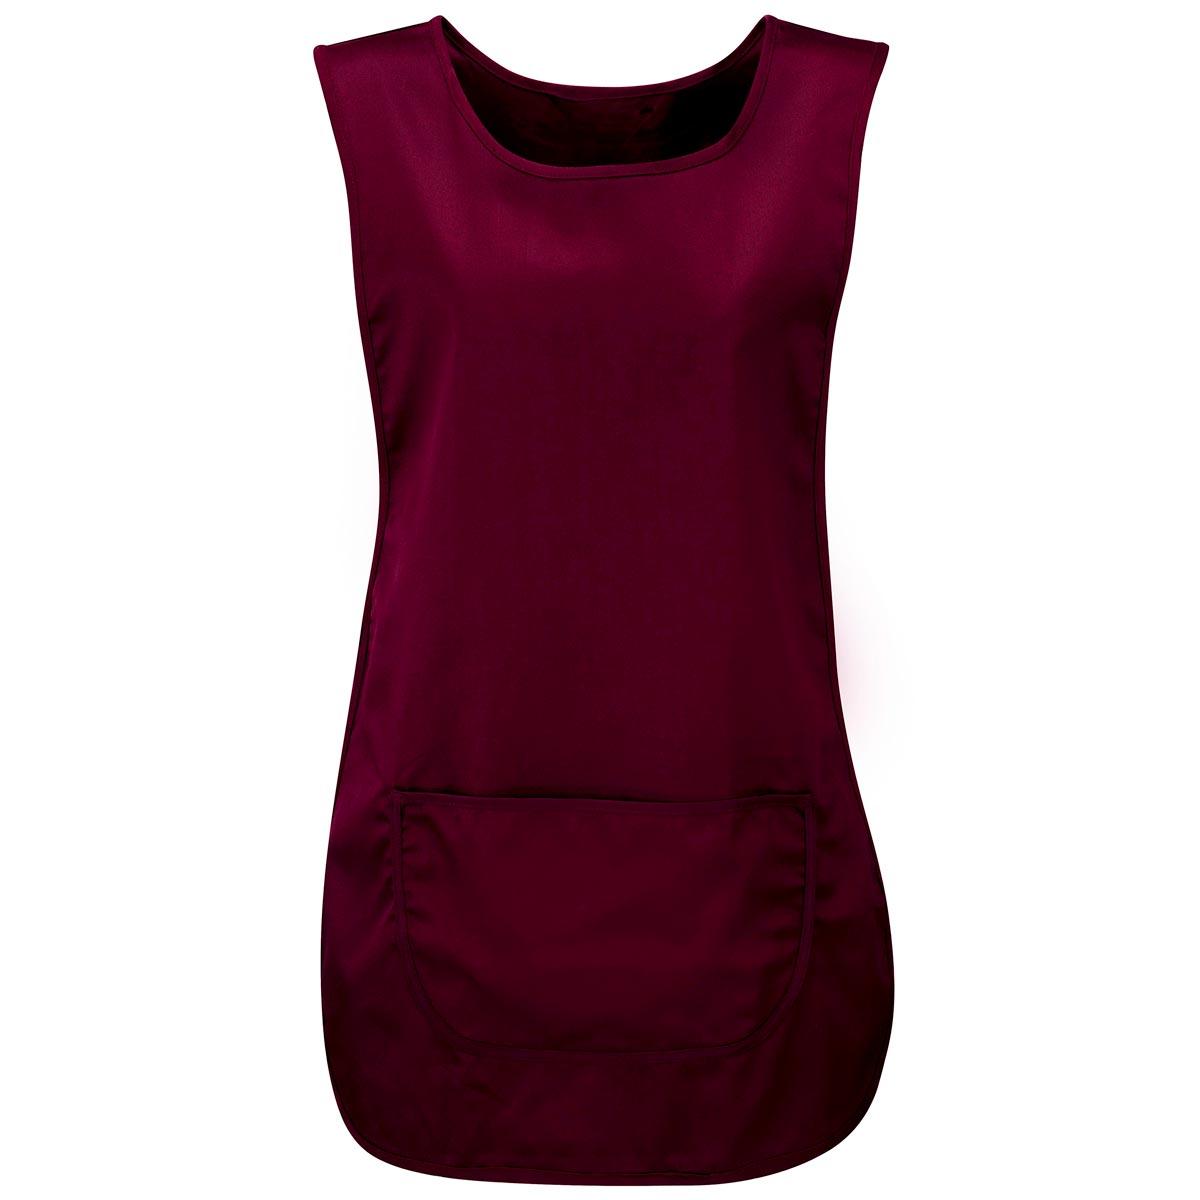 Standard Tabard With Pocket - WTAAB1-CTAB1-burgundy